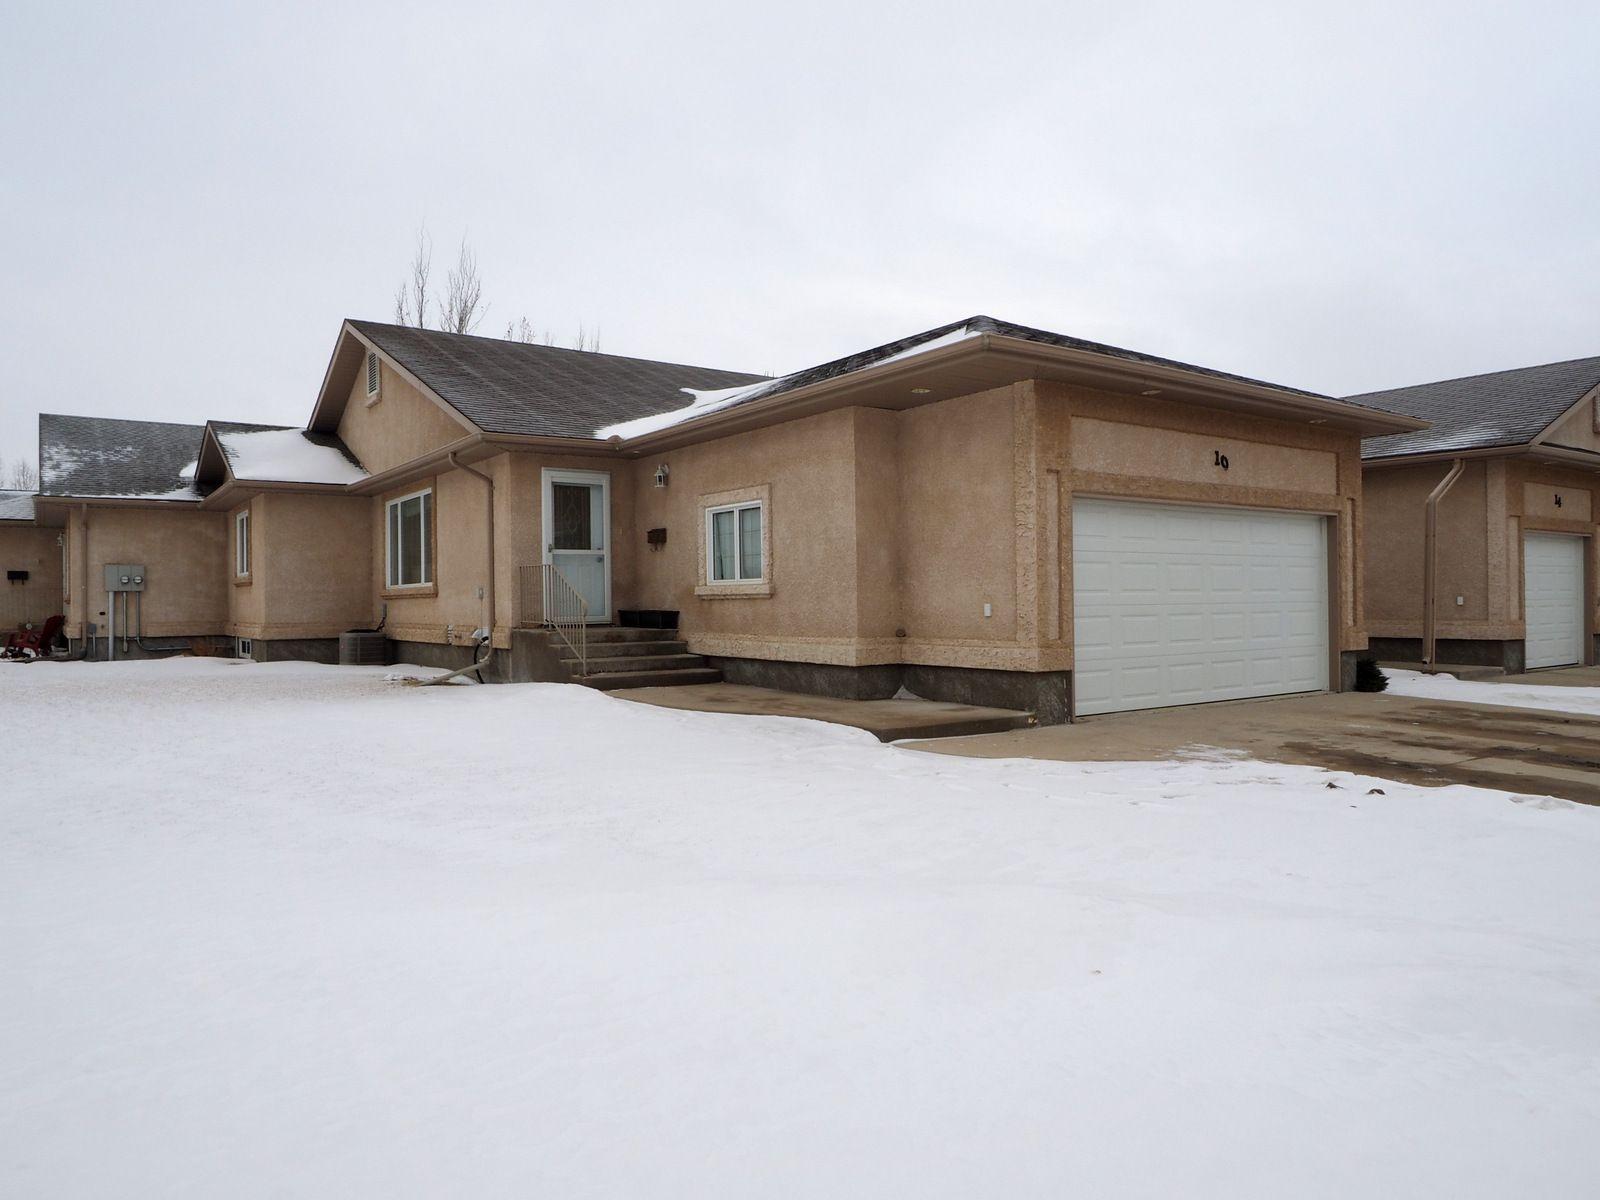 Main Photo: 10 Jack Cavers Place in Portage la Prairie: House for sale : MLS®# 202102033